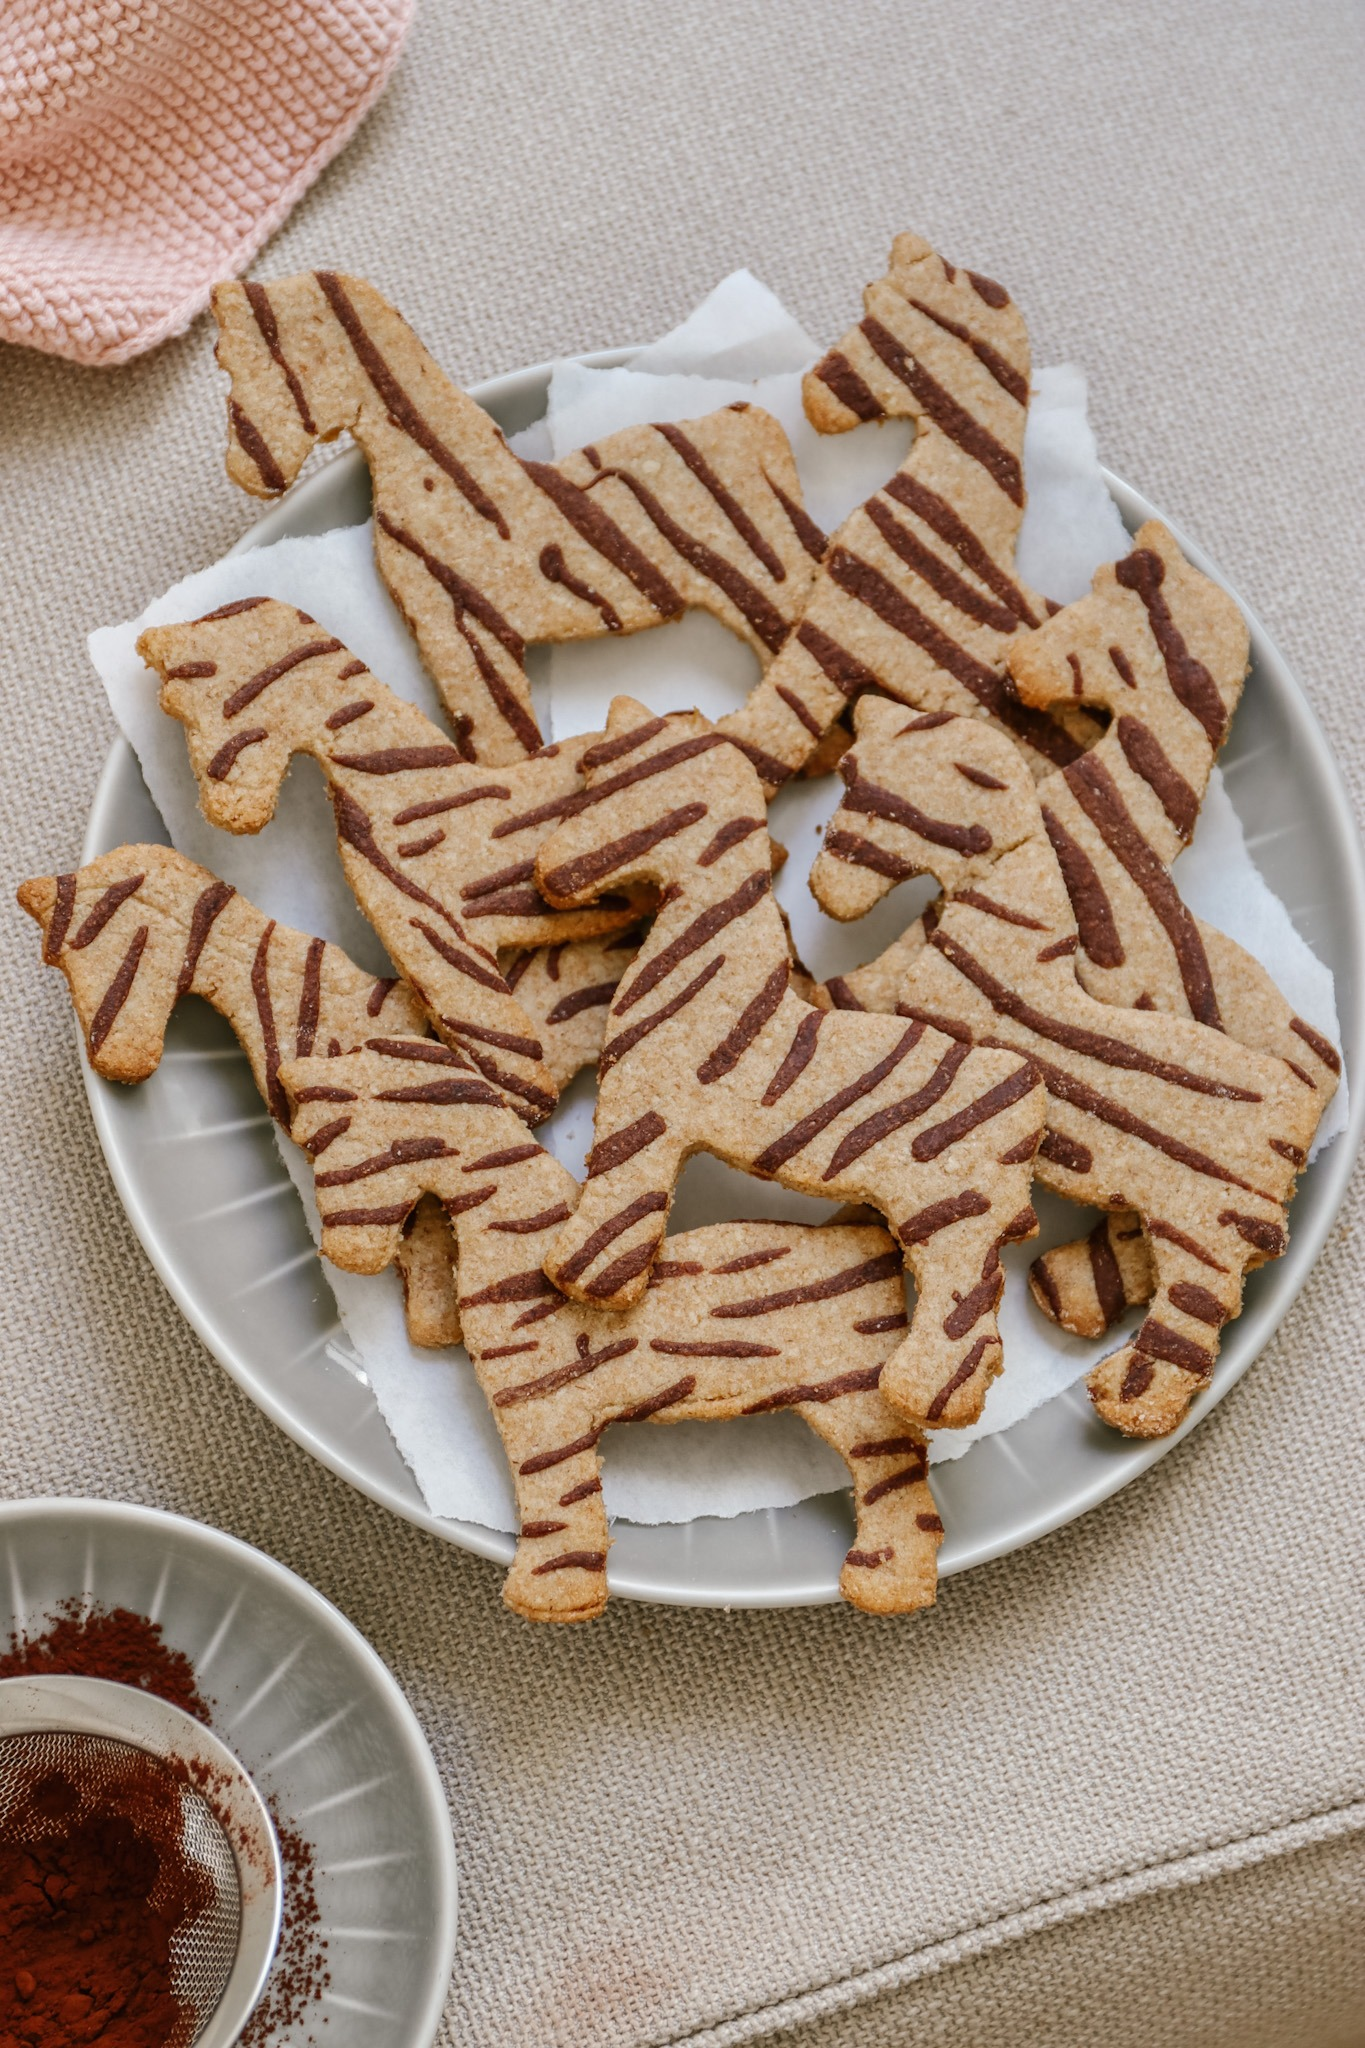 Kekse backen mit Kindern - lustige Tierkekse